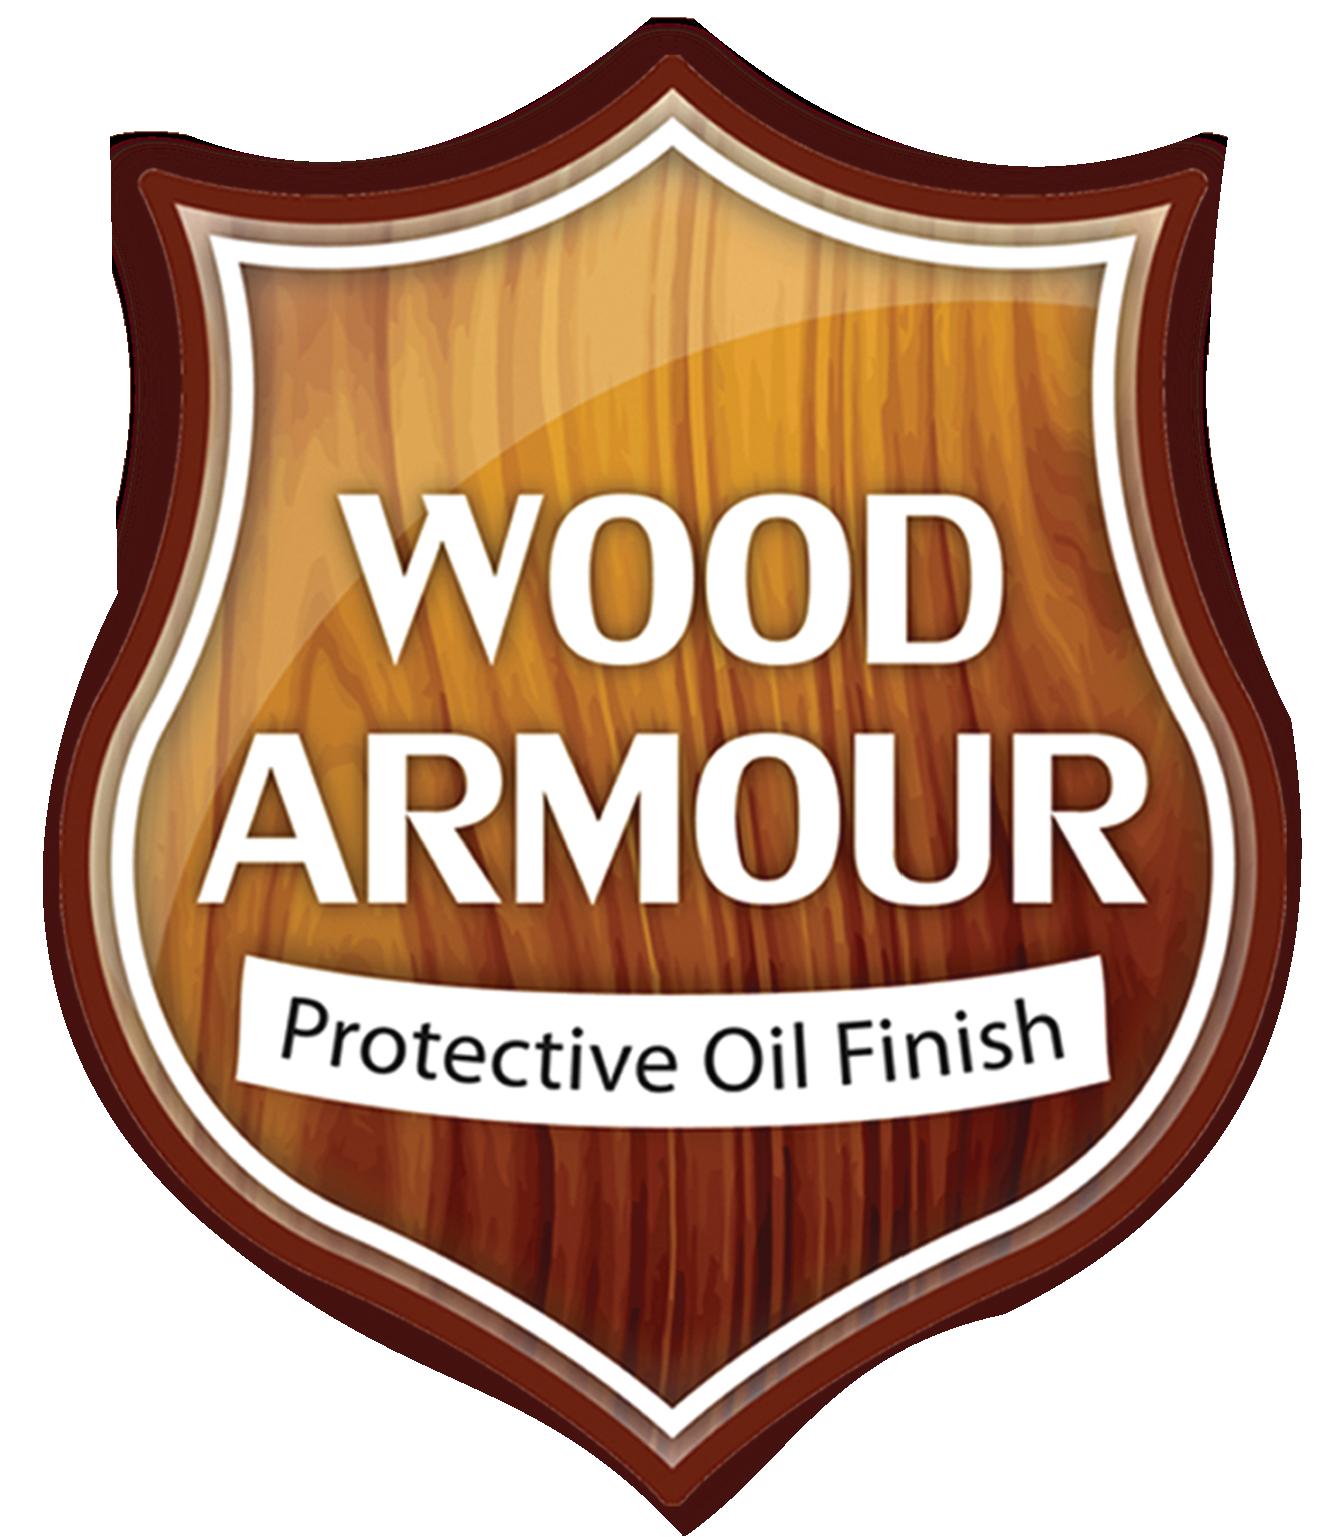 wood armour logo